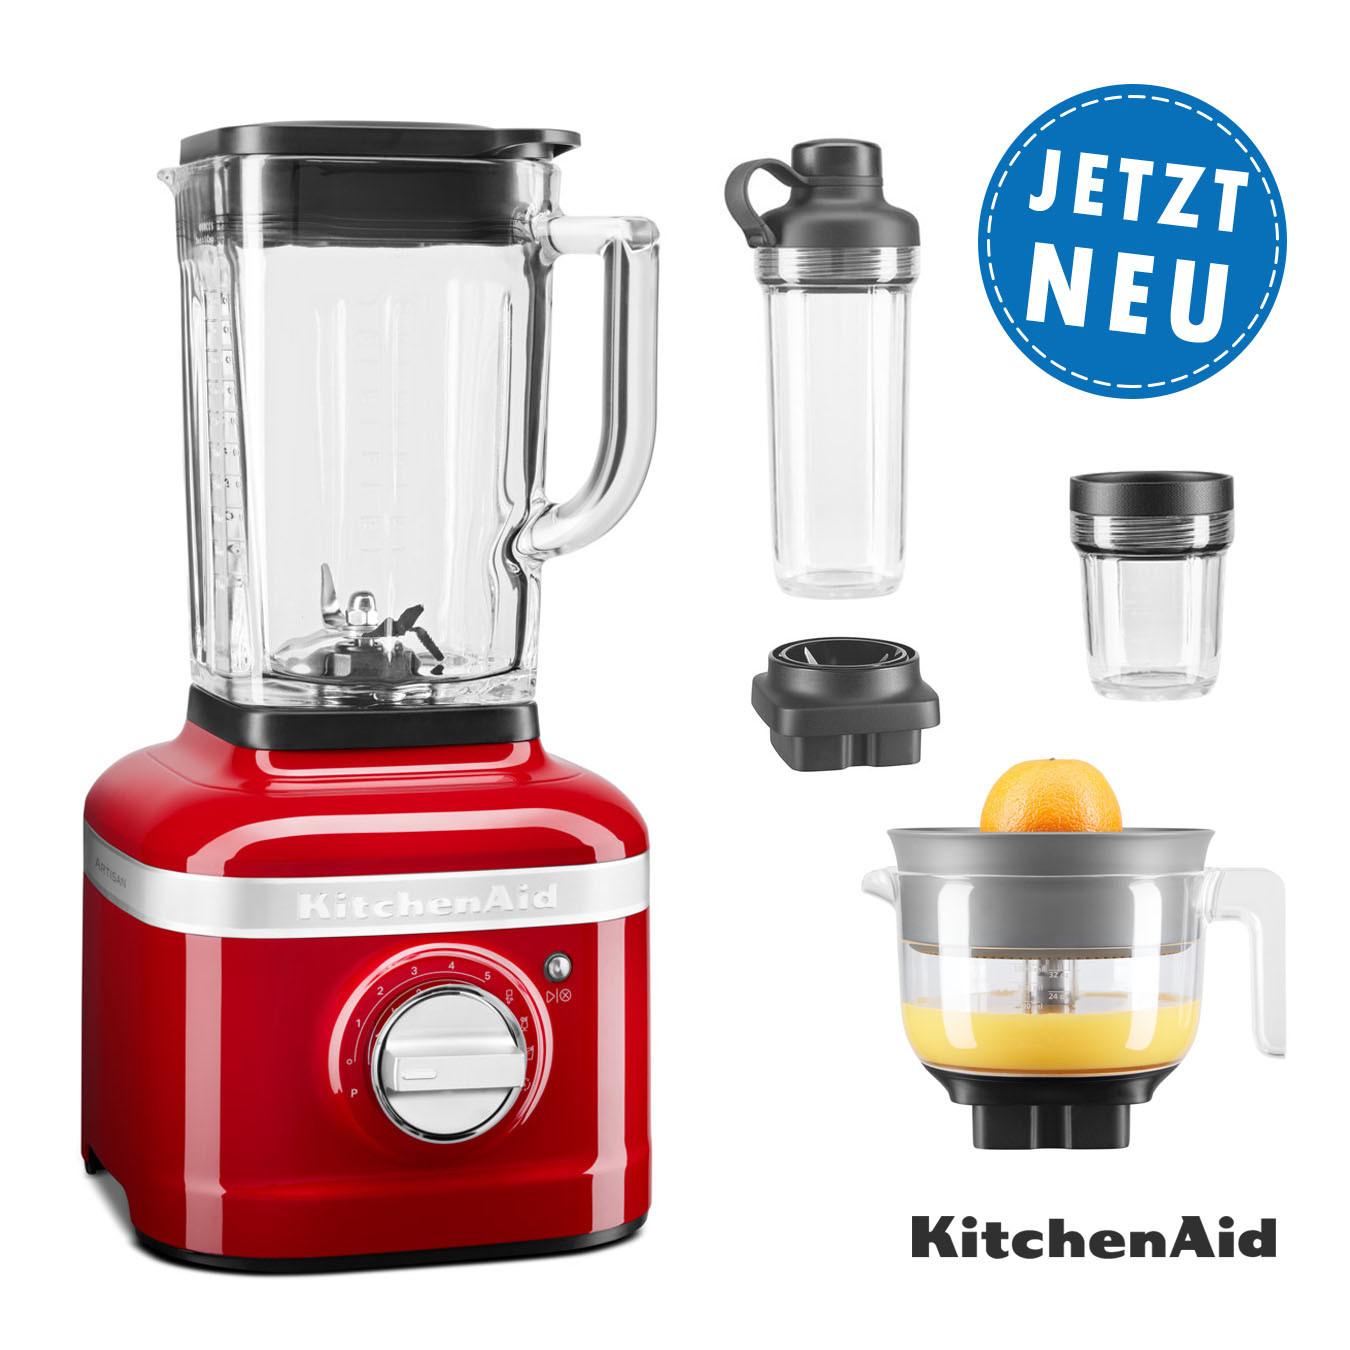 KitchenAid ARTISAN K400 Standmixer 5KSB4026EER empirerot Sparpaket